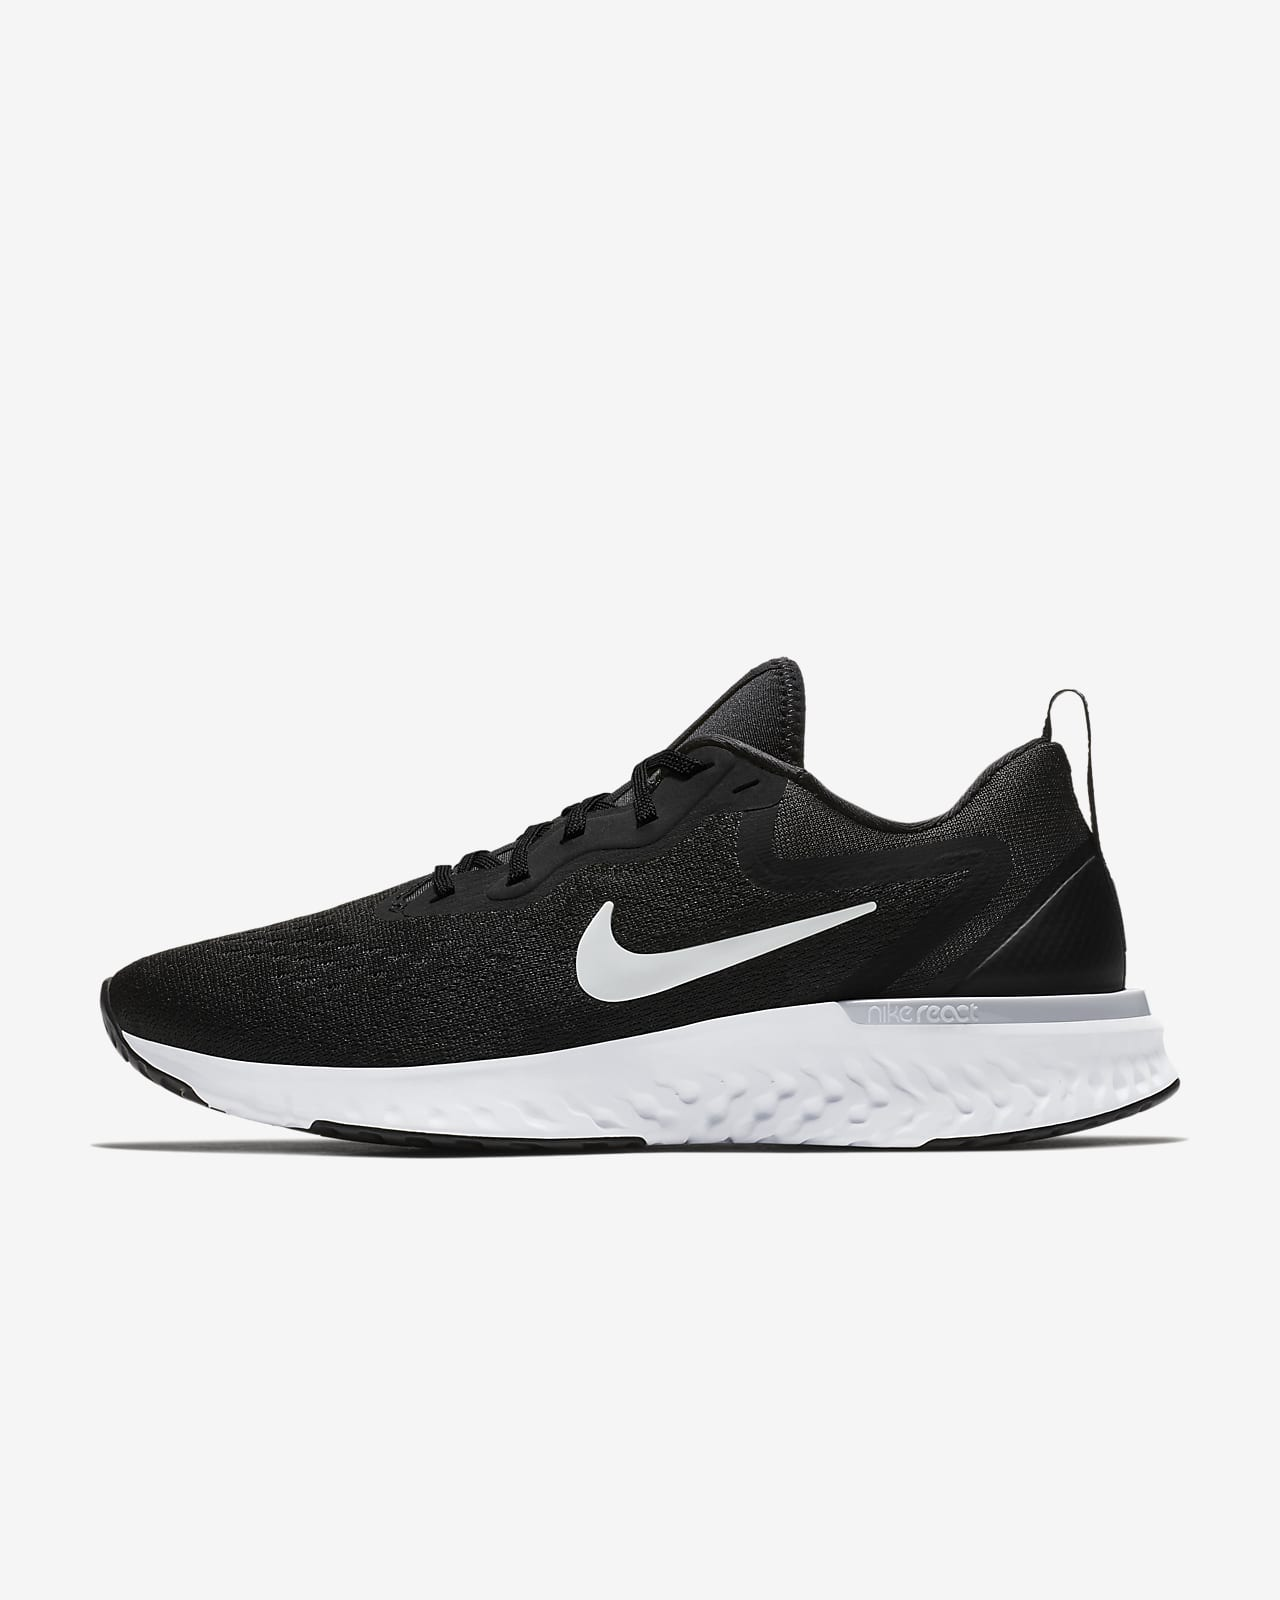 Encantador Accor Sociable  Nike Odyssey React Women's Running Shoe. Nike ID